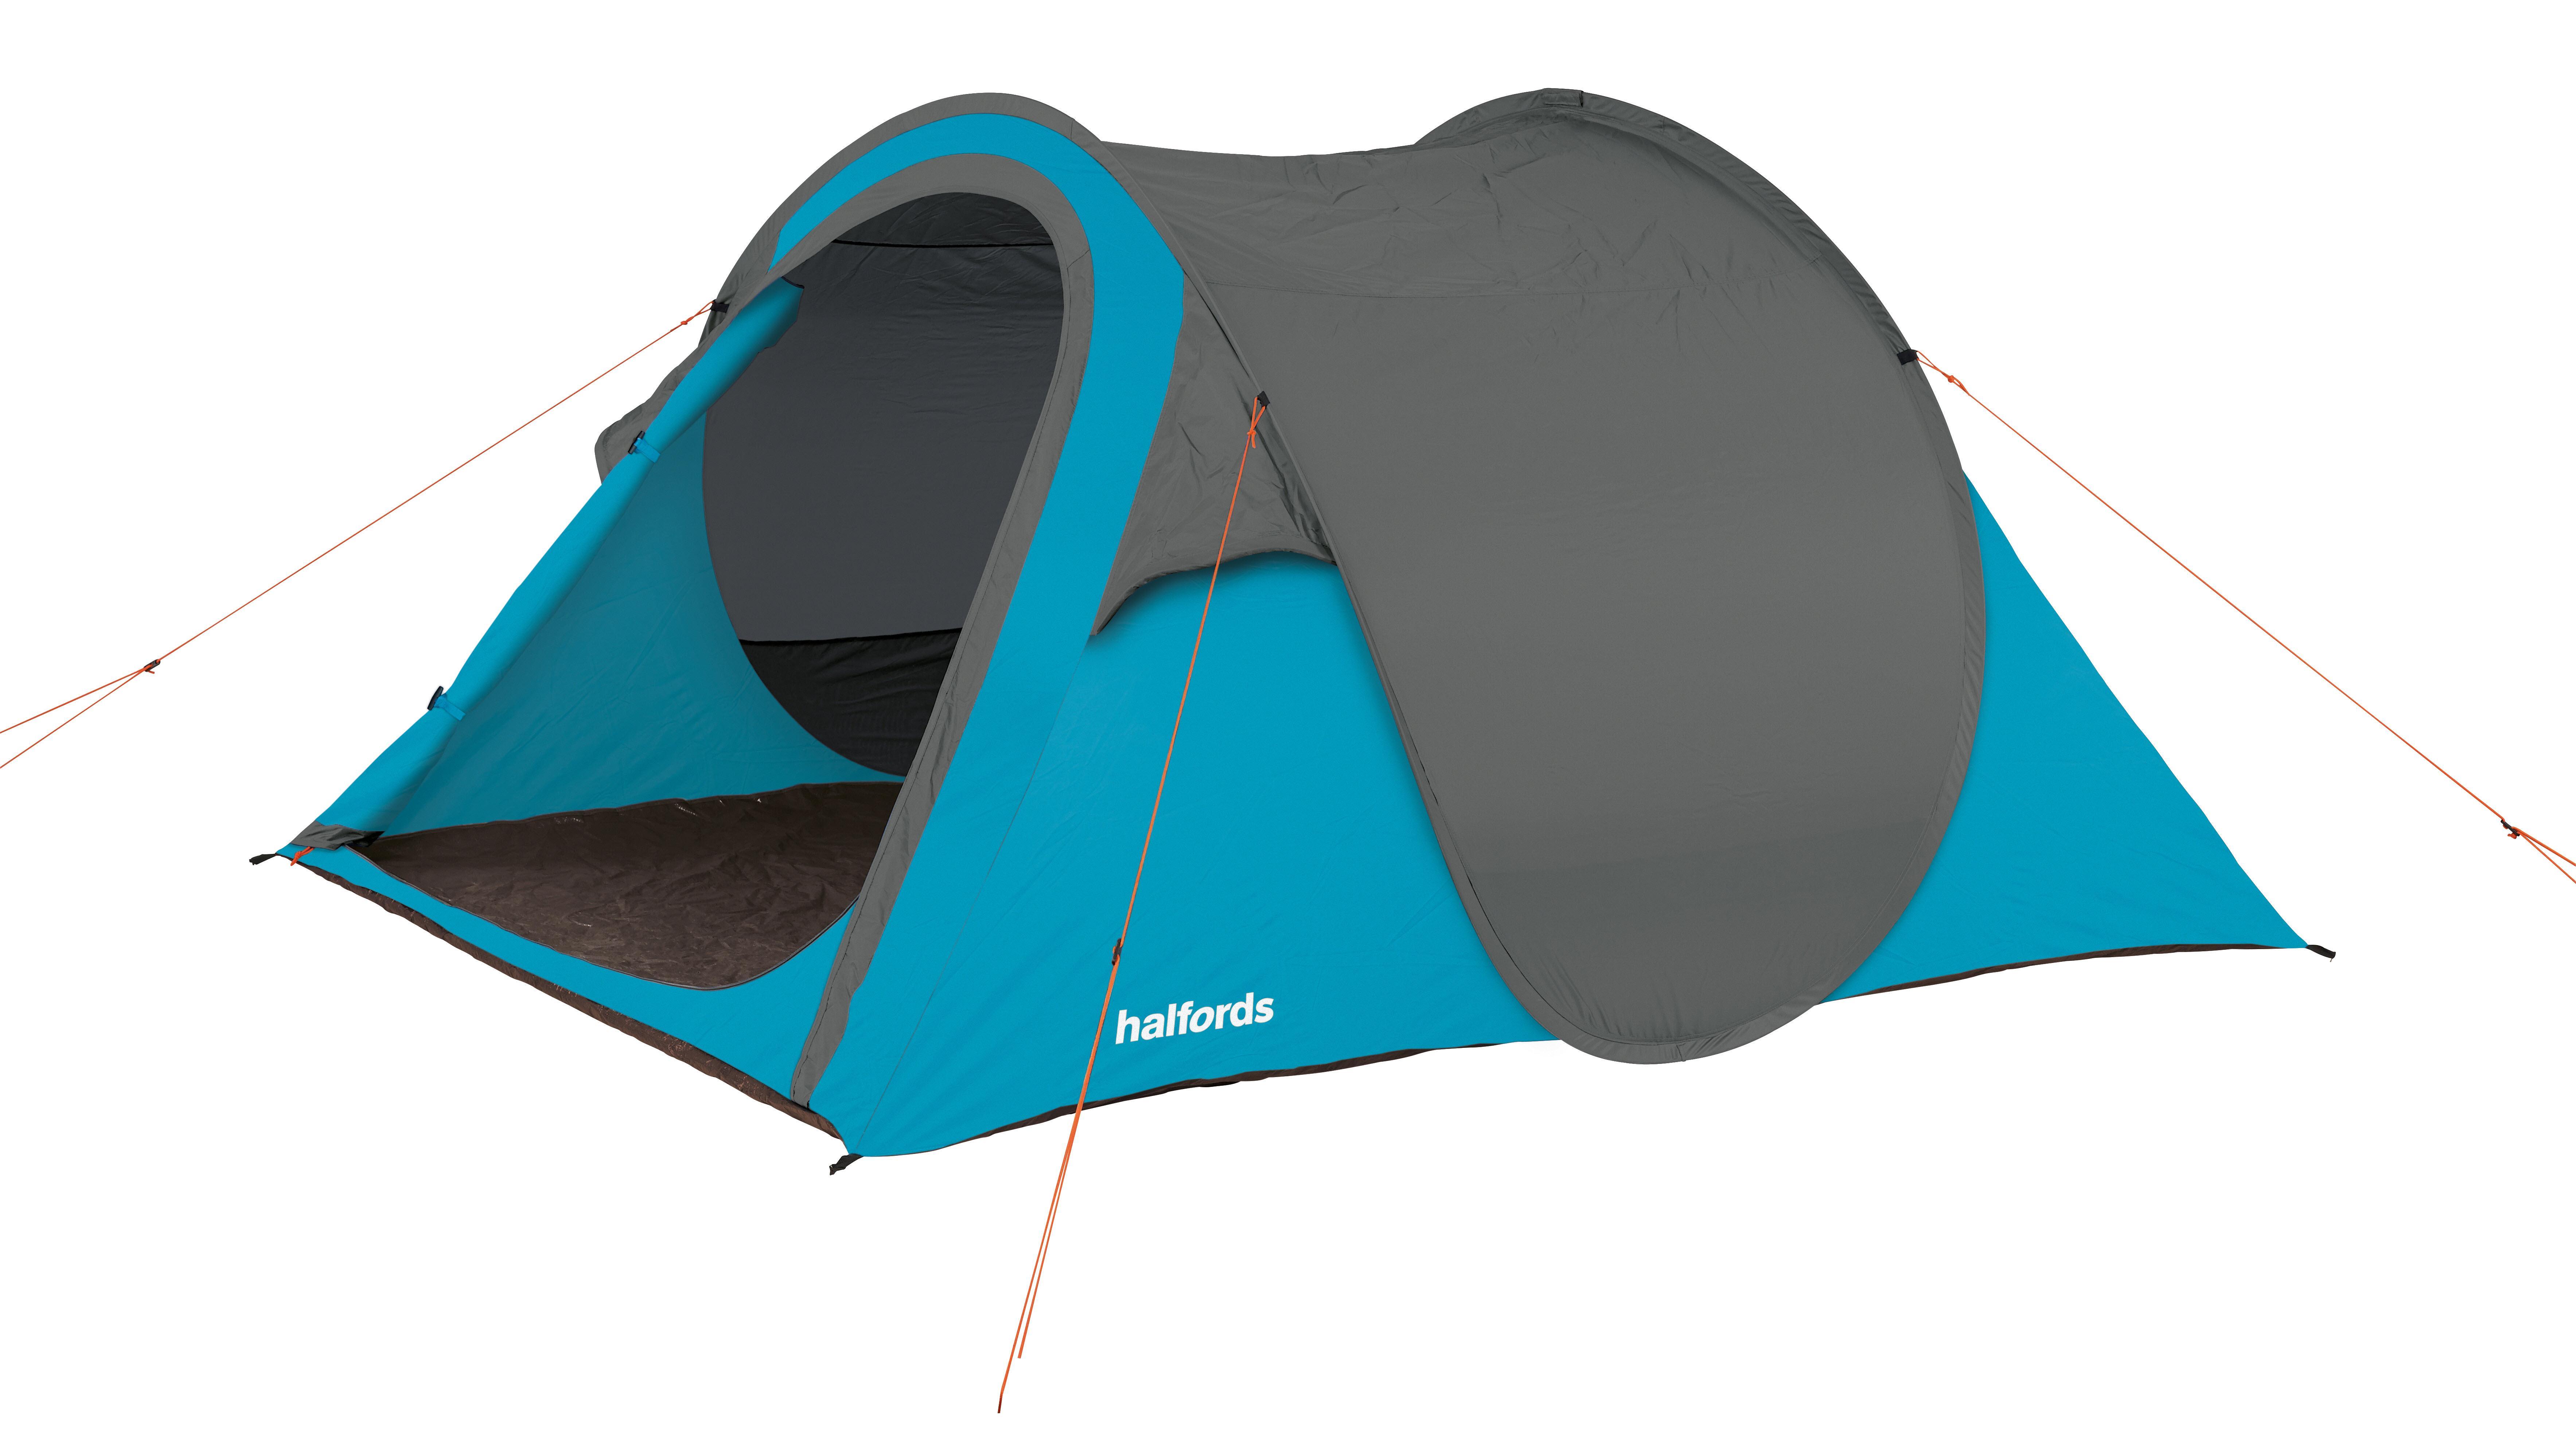 halfords 4 man pop up tent